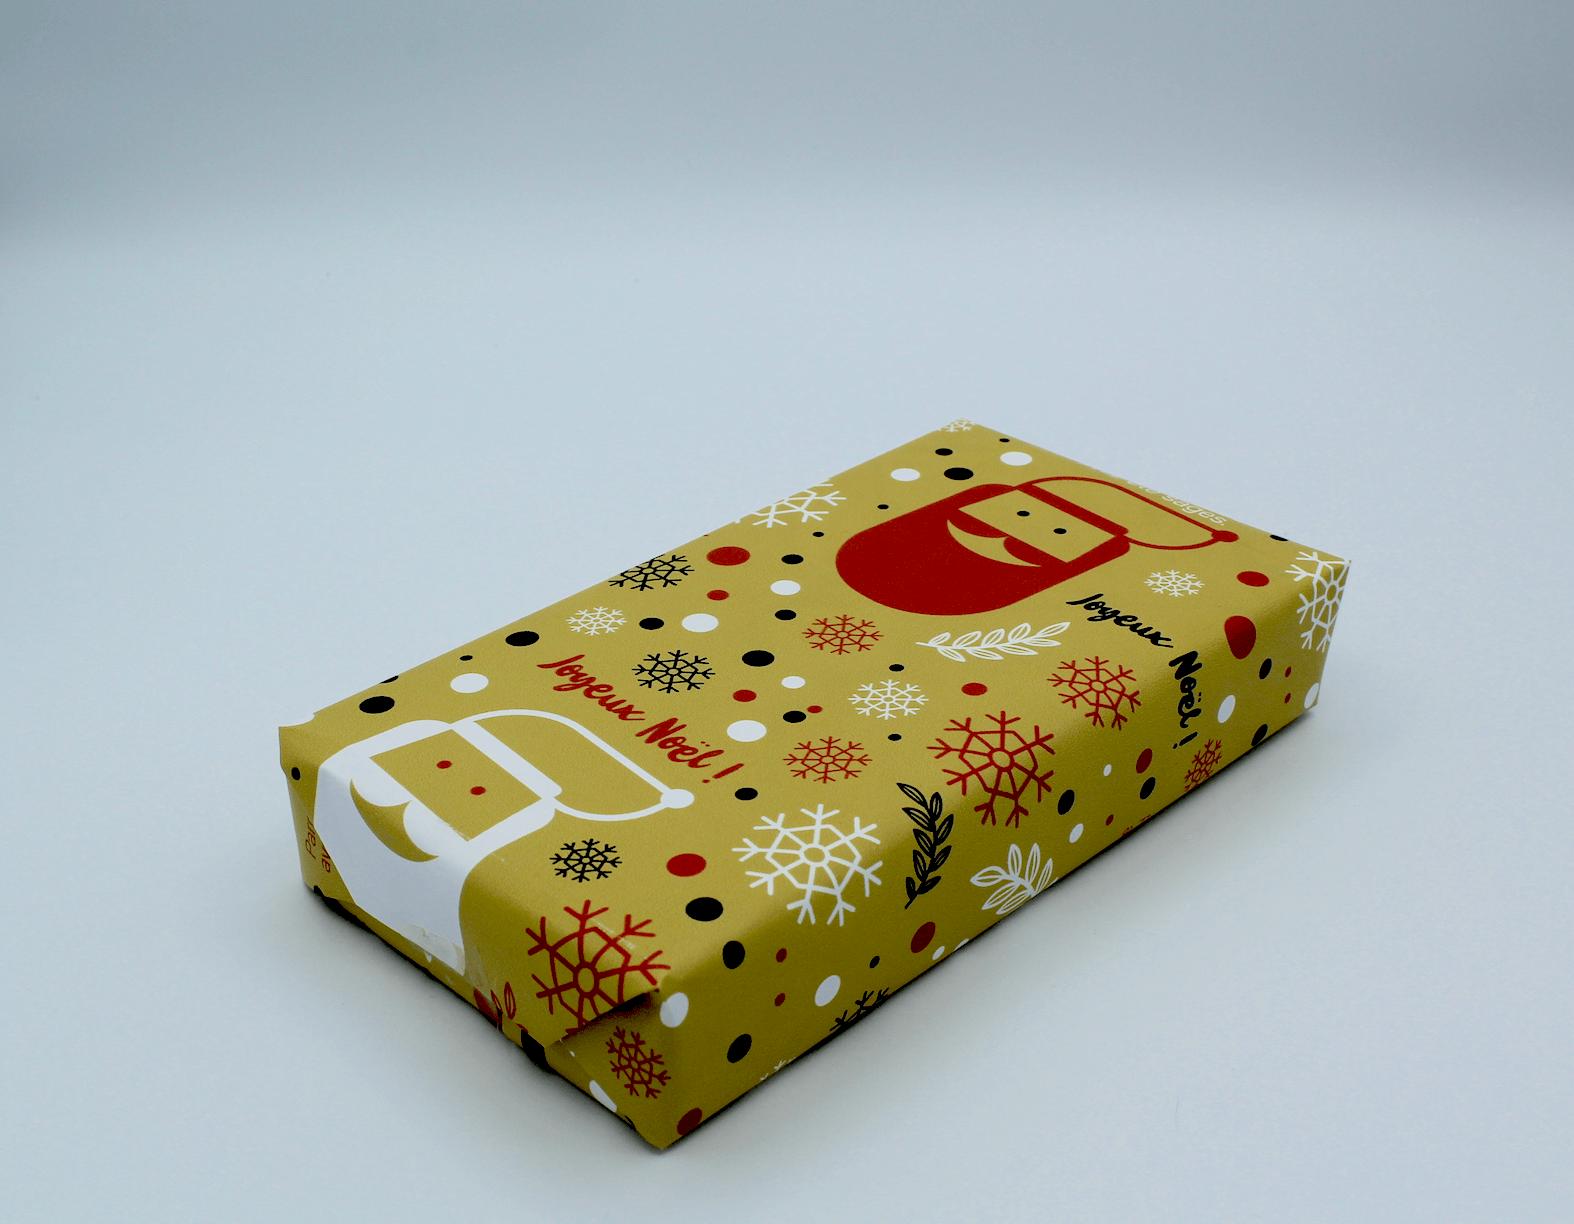 emballage papier cadeau pere noel